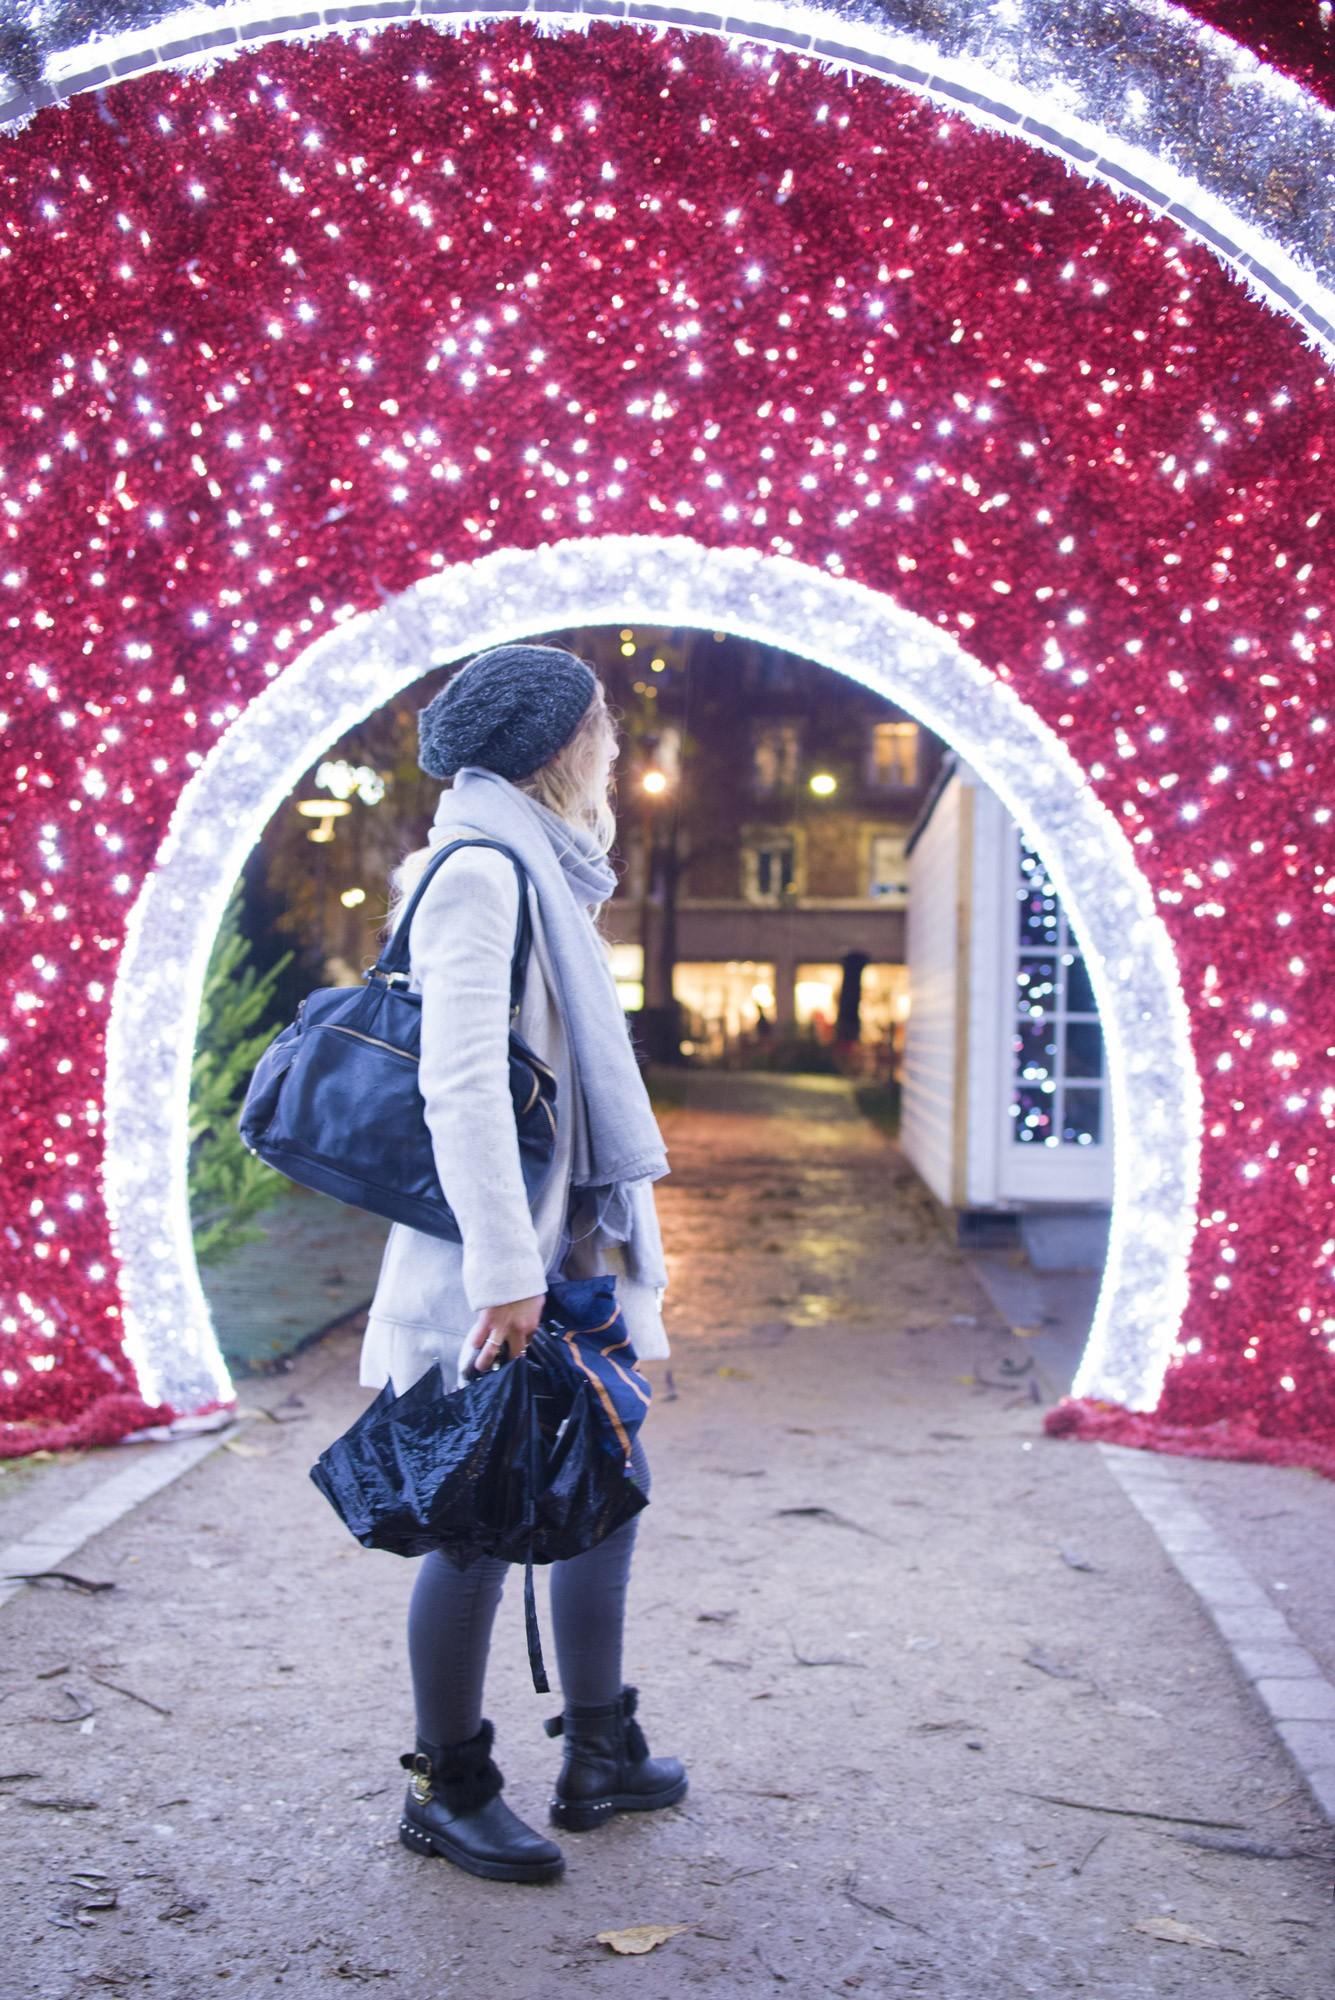 Illumination de Noel Amiens 2019